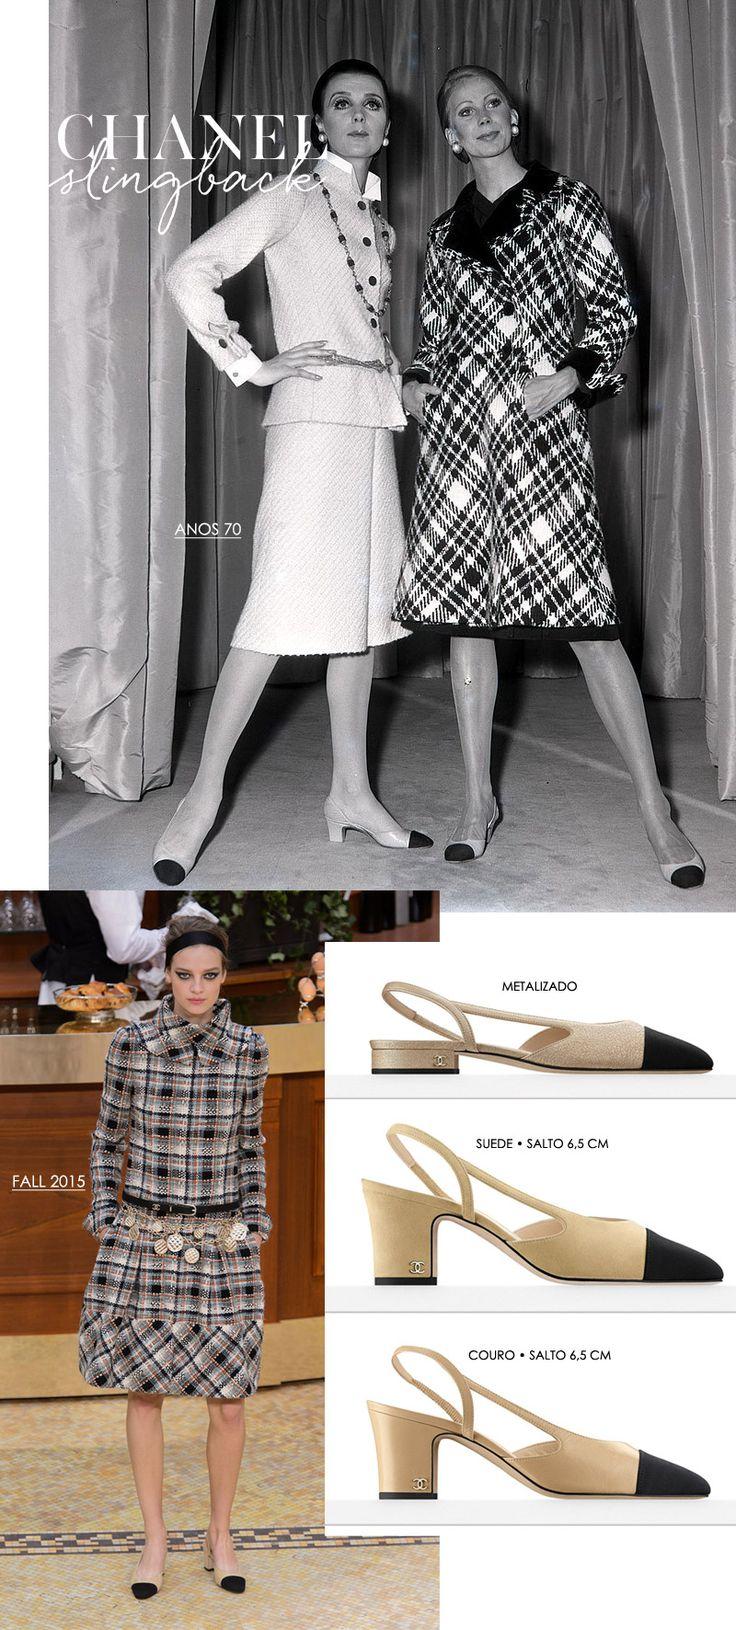 O sapato da vez: cap toe slingback da Chanel